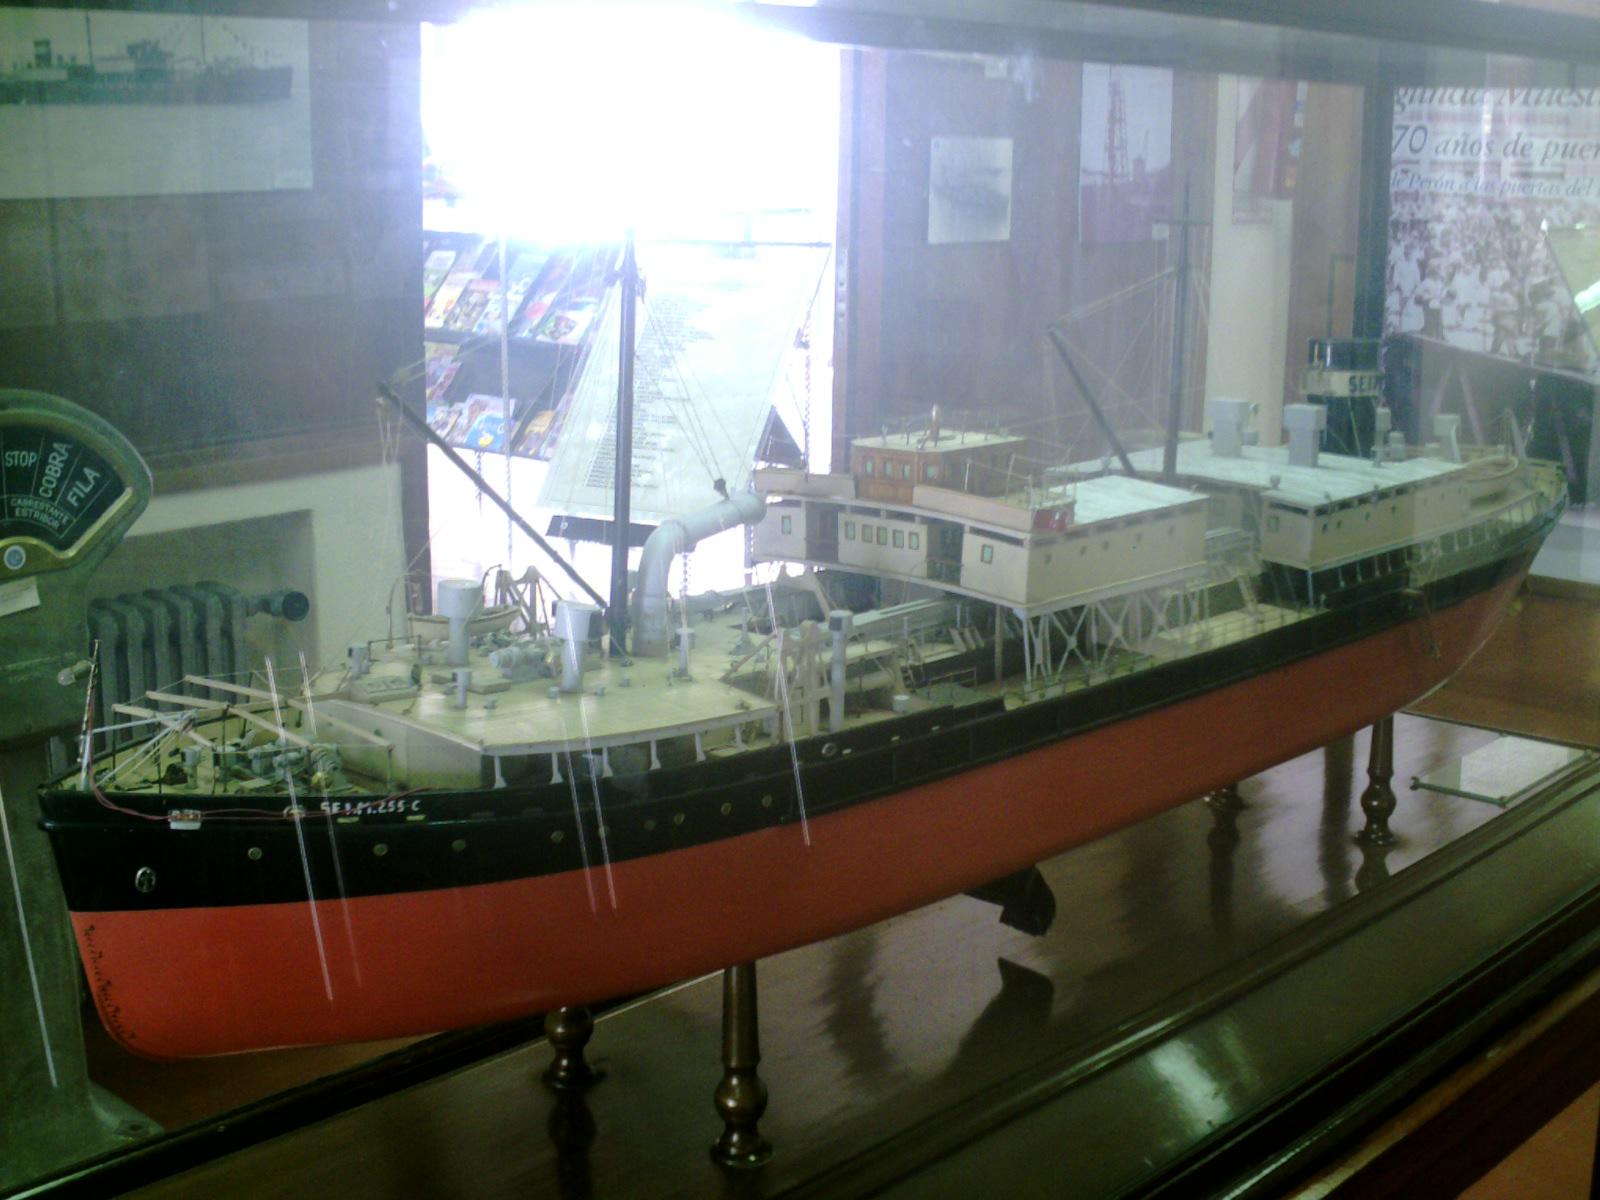 muestra-museo-puerto-13-10-09-k